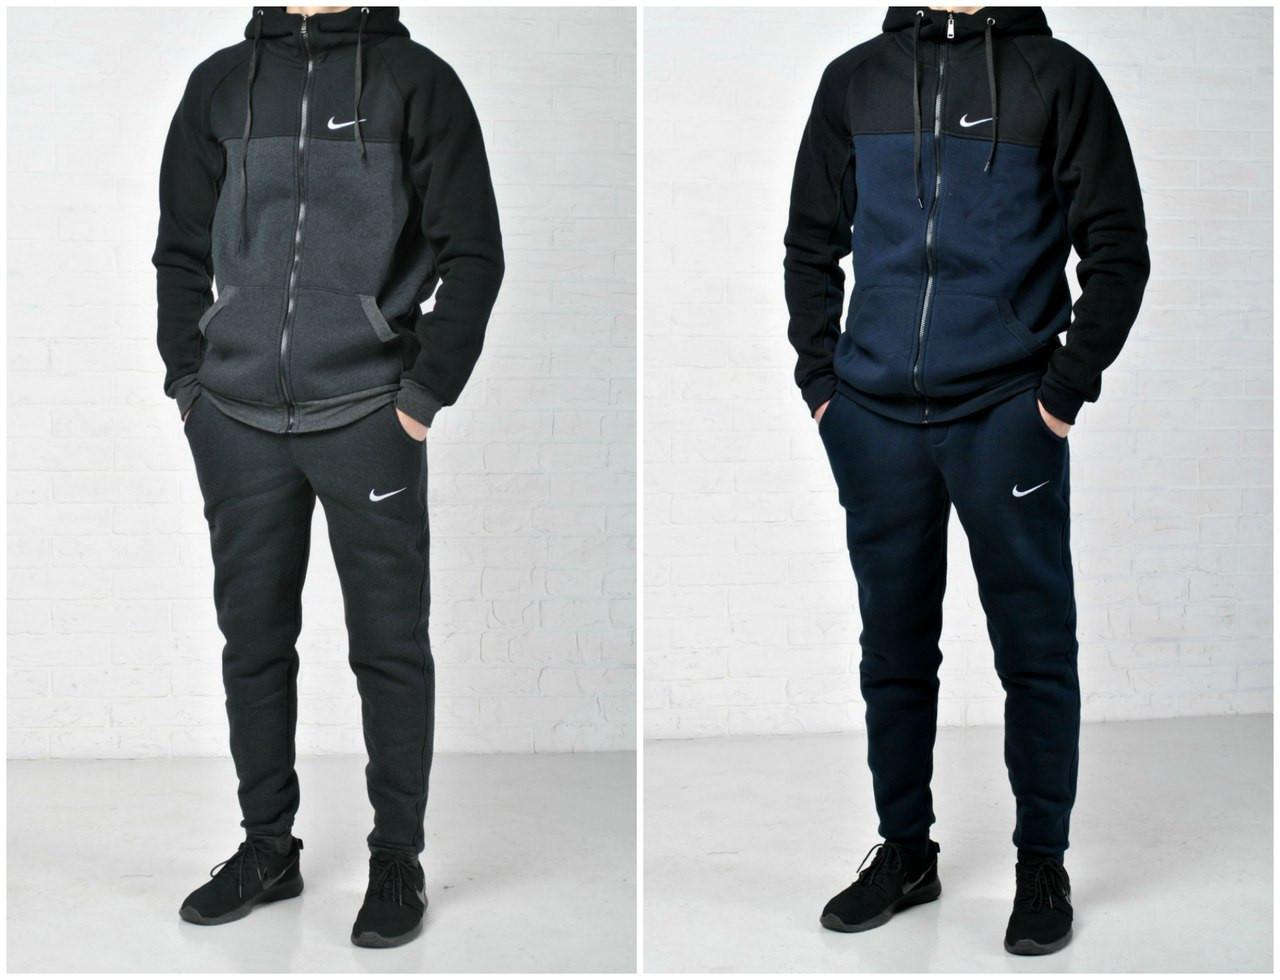 1a13d6c9309e Утепленные мужские спортивные костюмы Nike осень зима утепленные с  капюшоном р-ры S M L XL